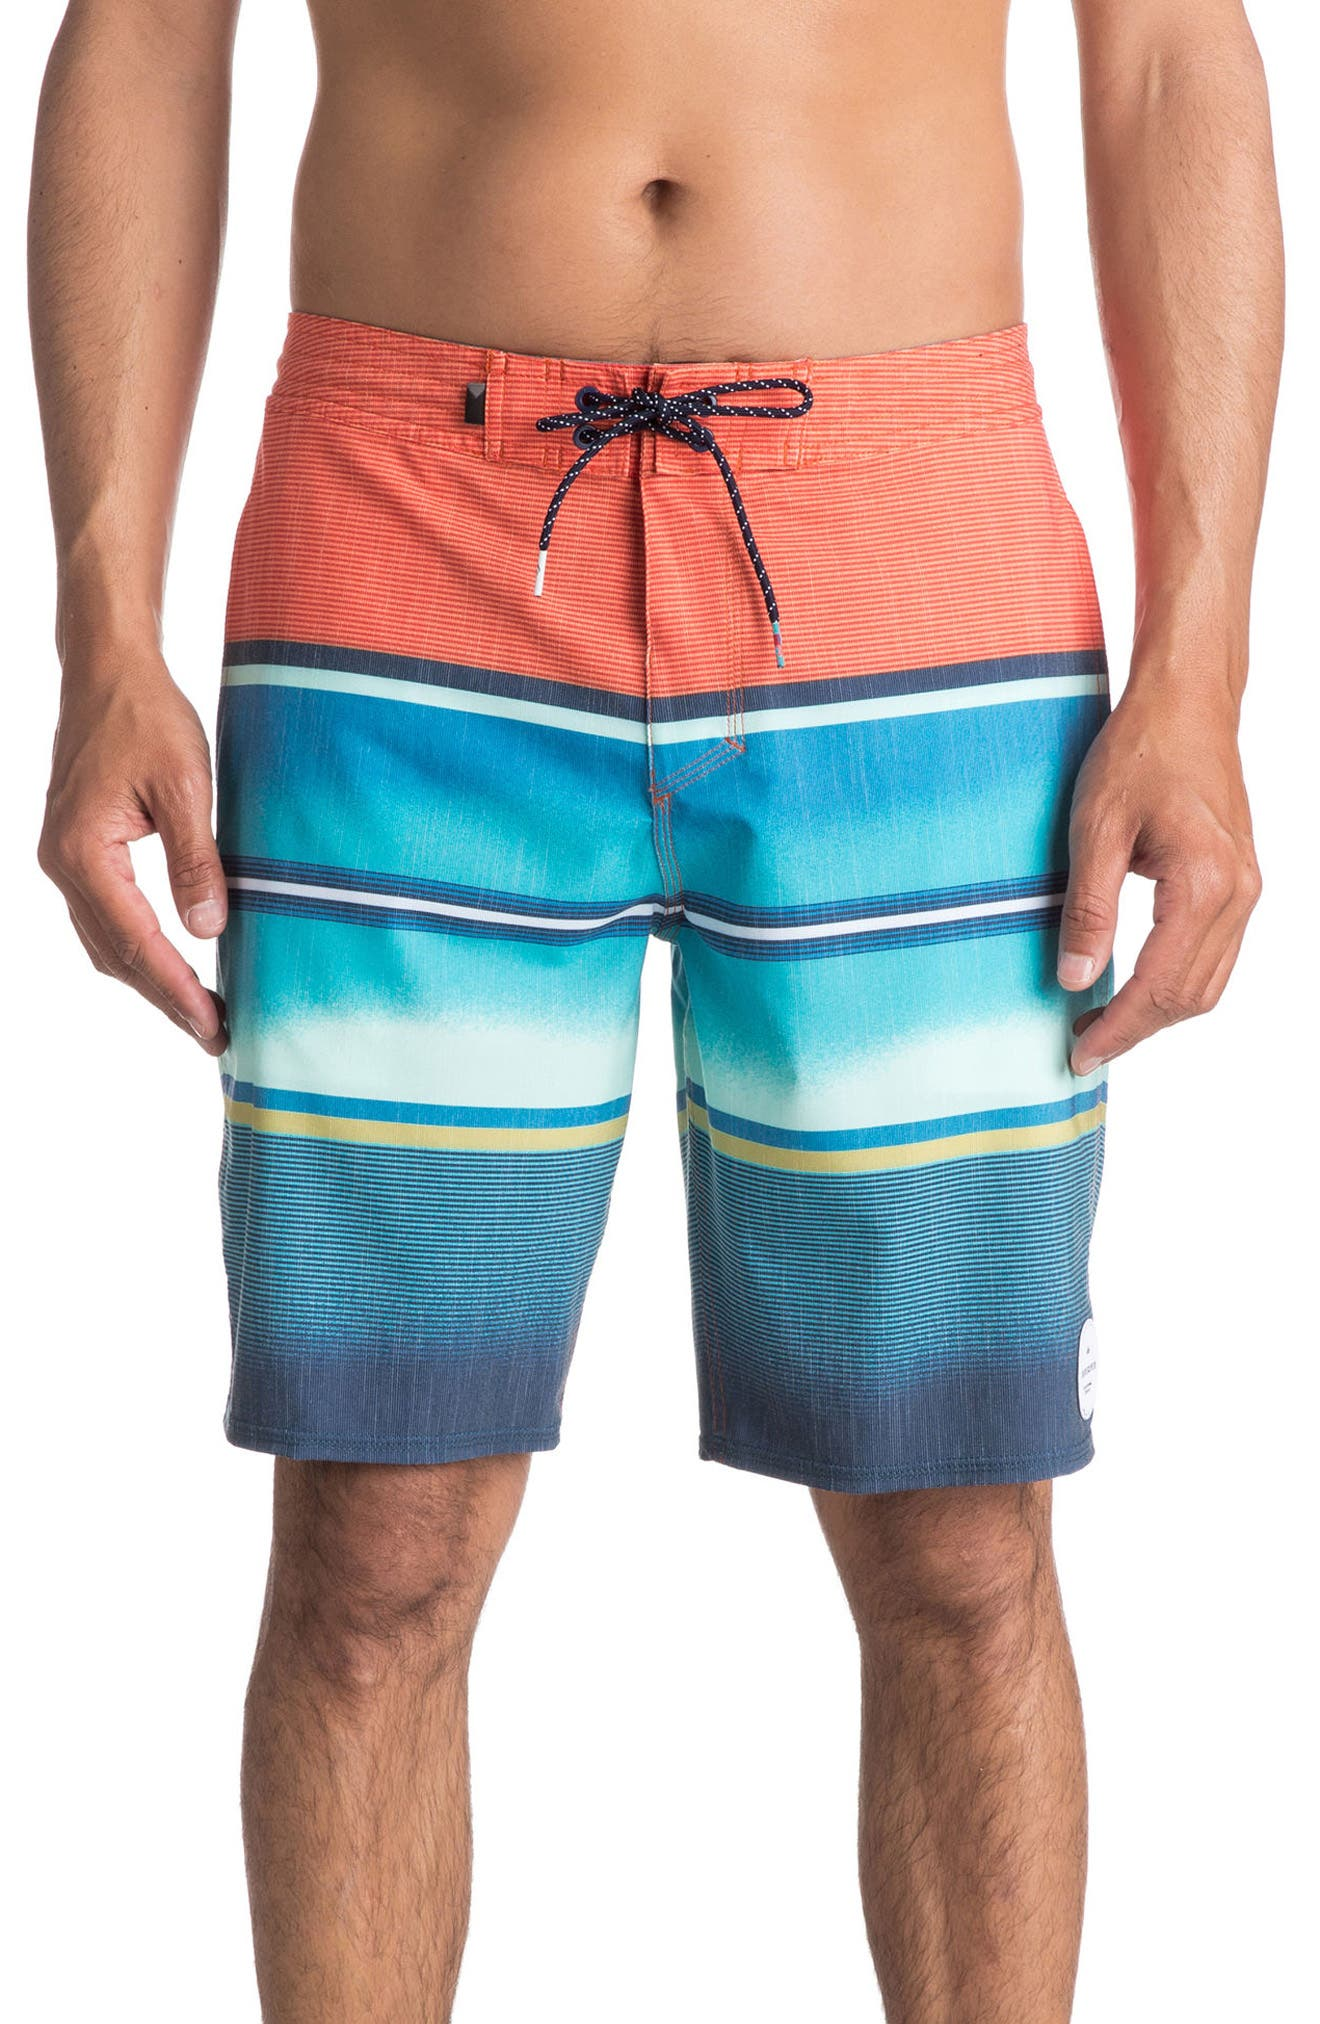 Swell Vision Board Shorts,                         Main,                         color, 650